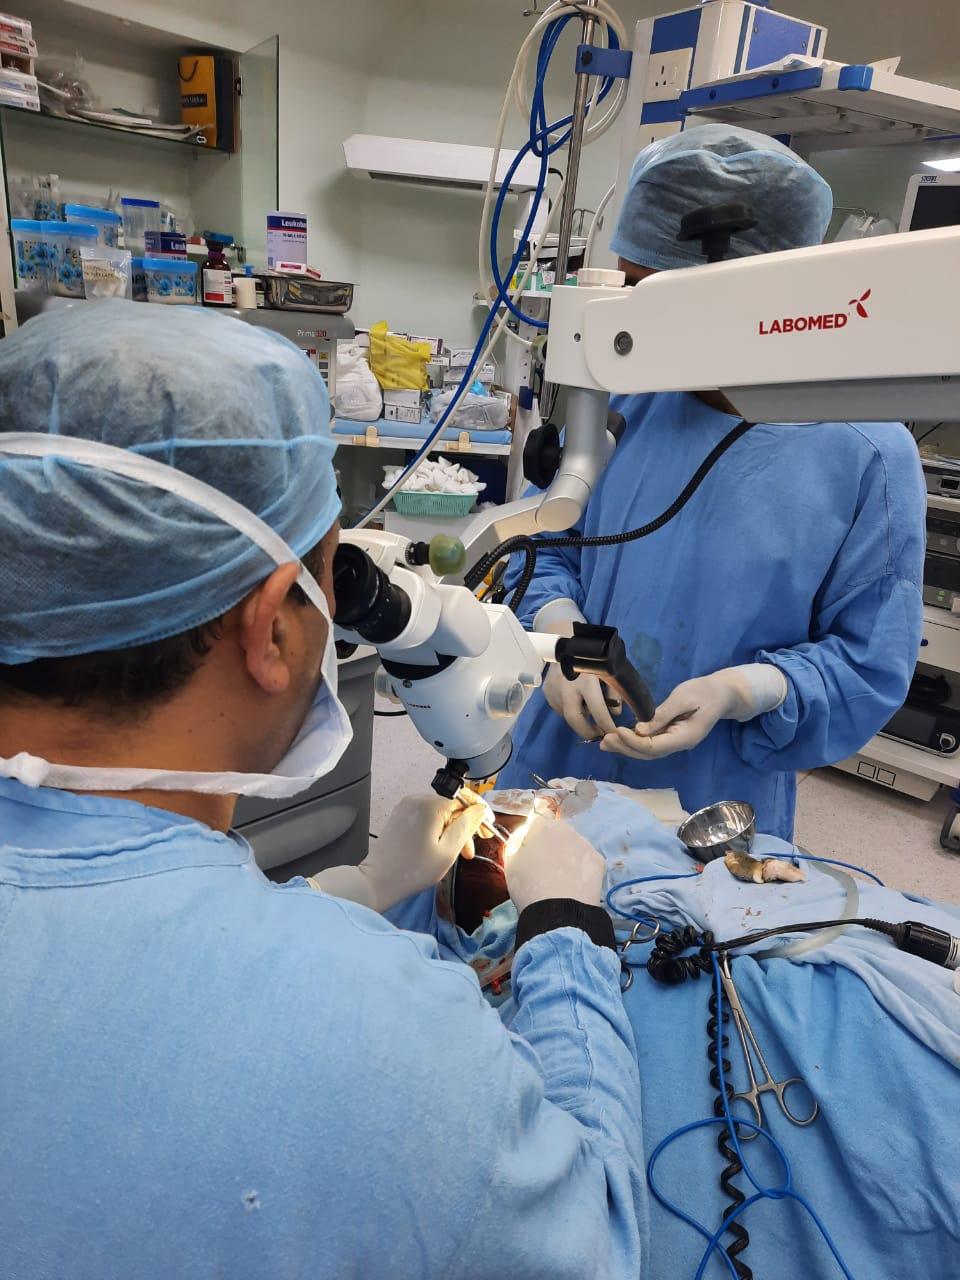 ent surgeon in dehradun, uttarakhand